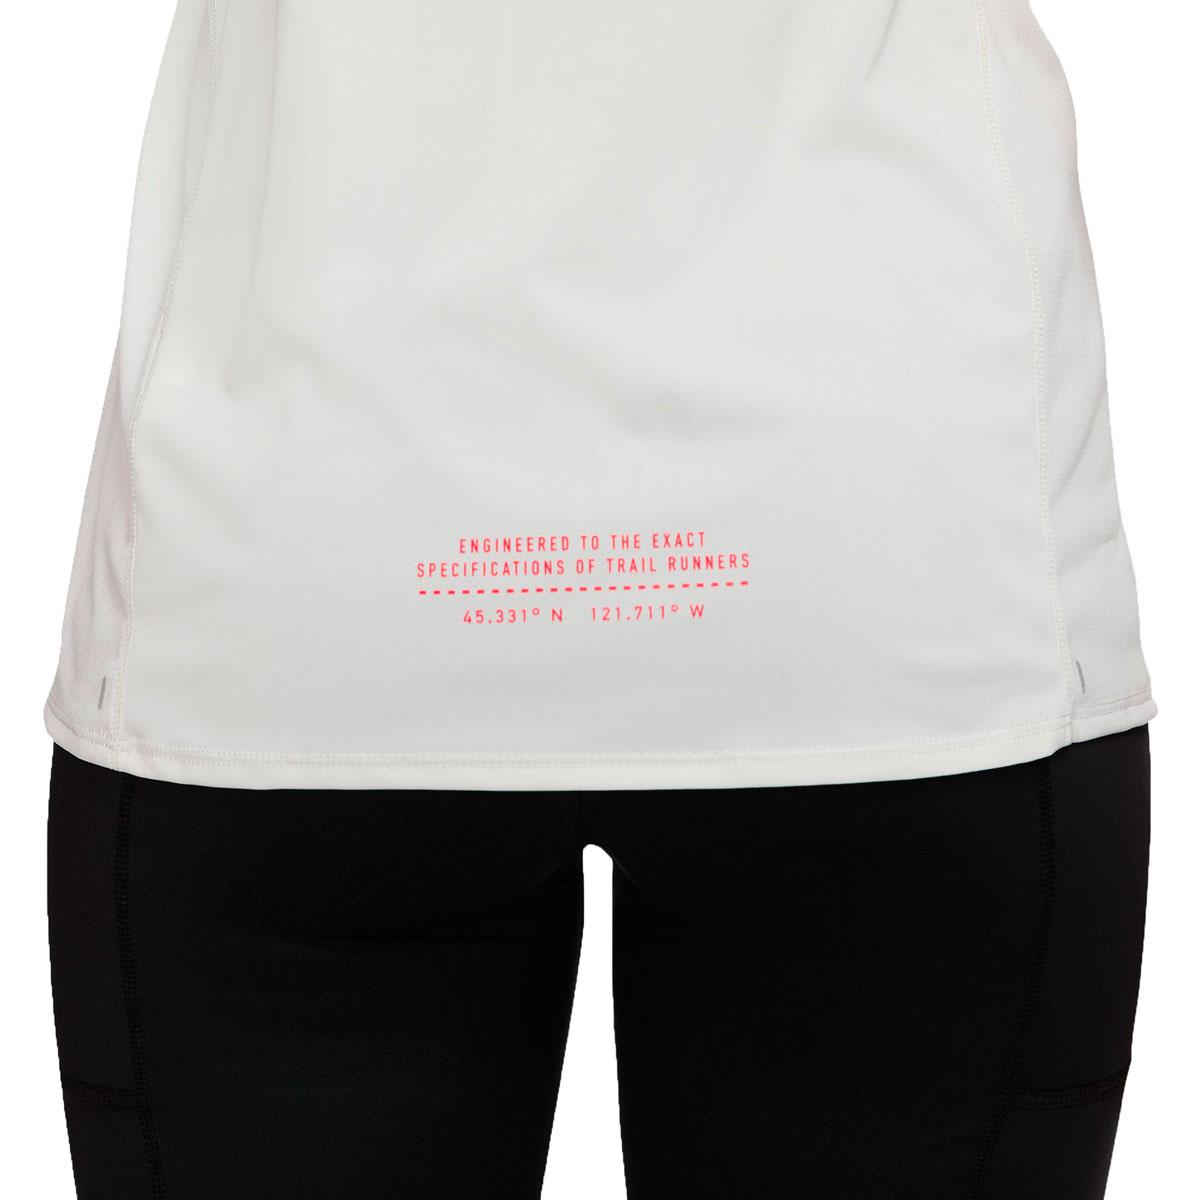 Women's Nike City Sleek Trail Running Tank - Color: Sail/Mint Foam/Laser Crimson - Size: XS, Sail/Mint Foam/Laser Crimson, large, image 4